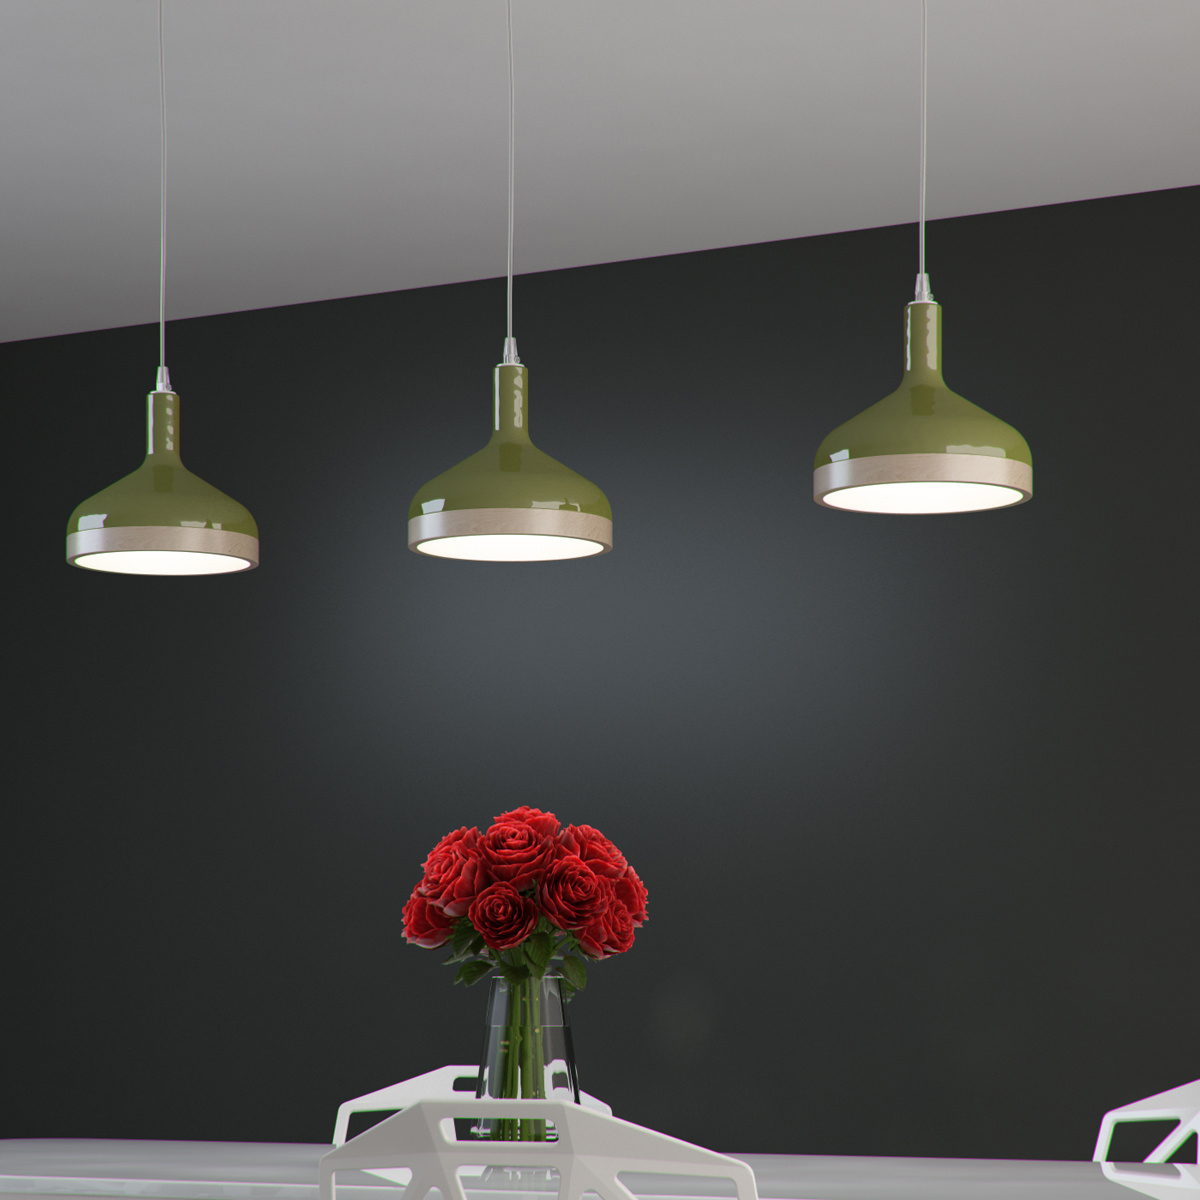 Plera Lamp by Enrico Zanolla - 03